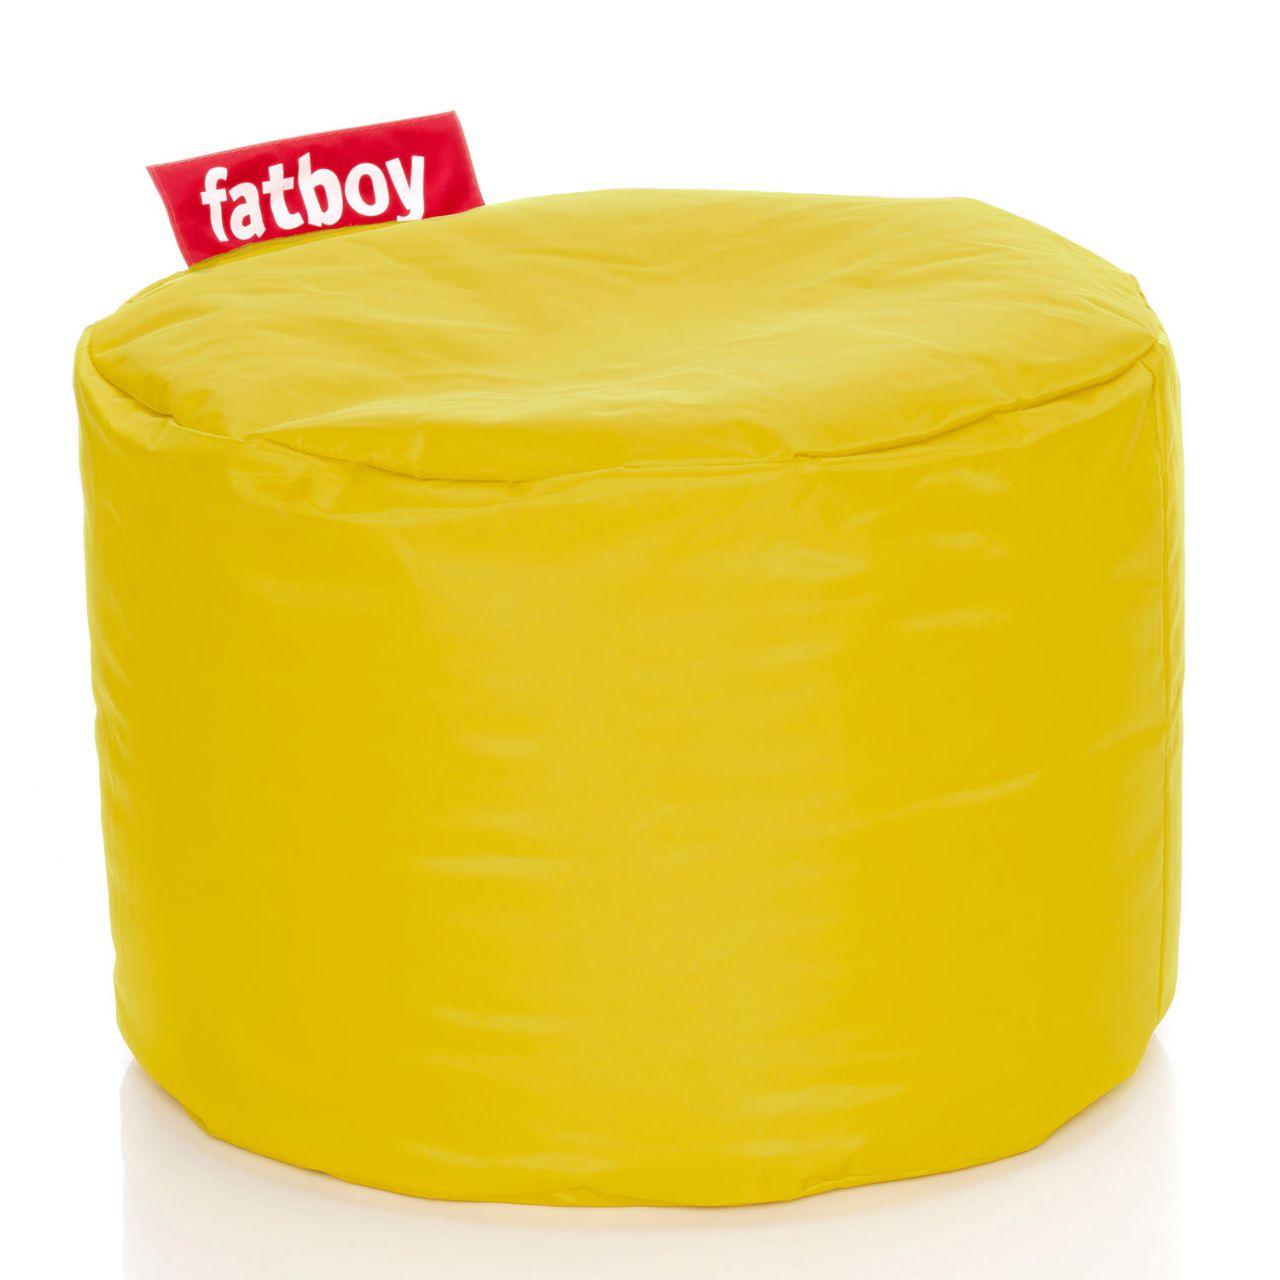 Fatboy - Point Sitzhocker 900.0154